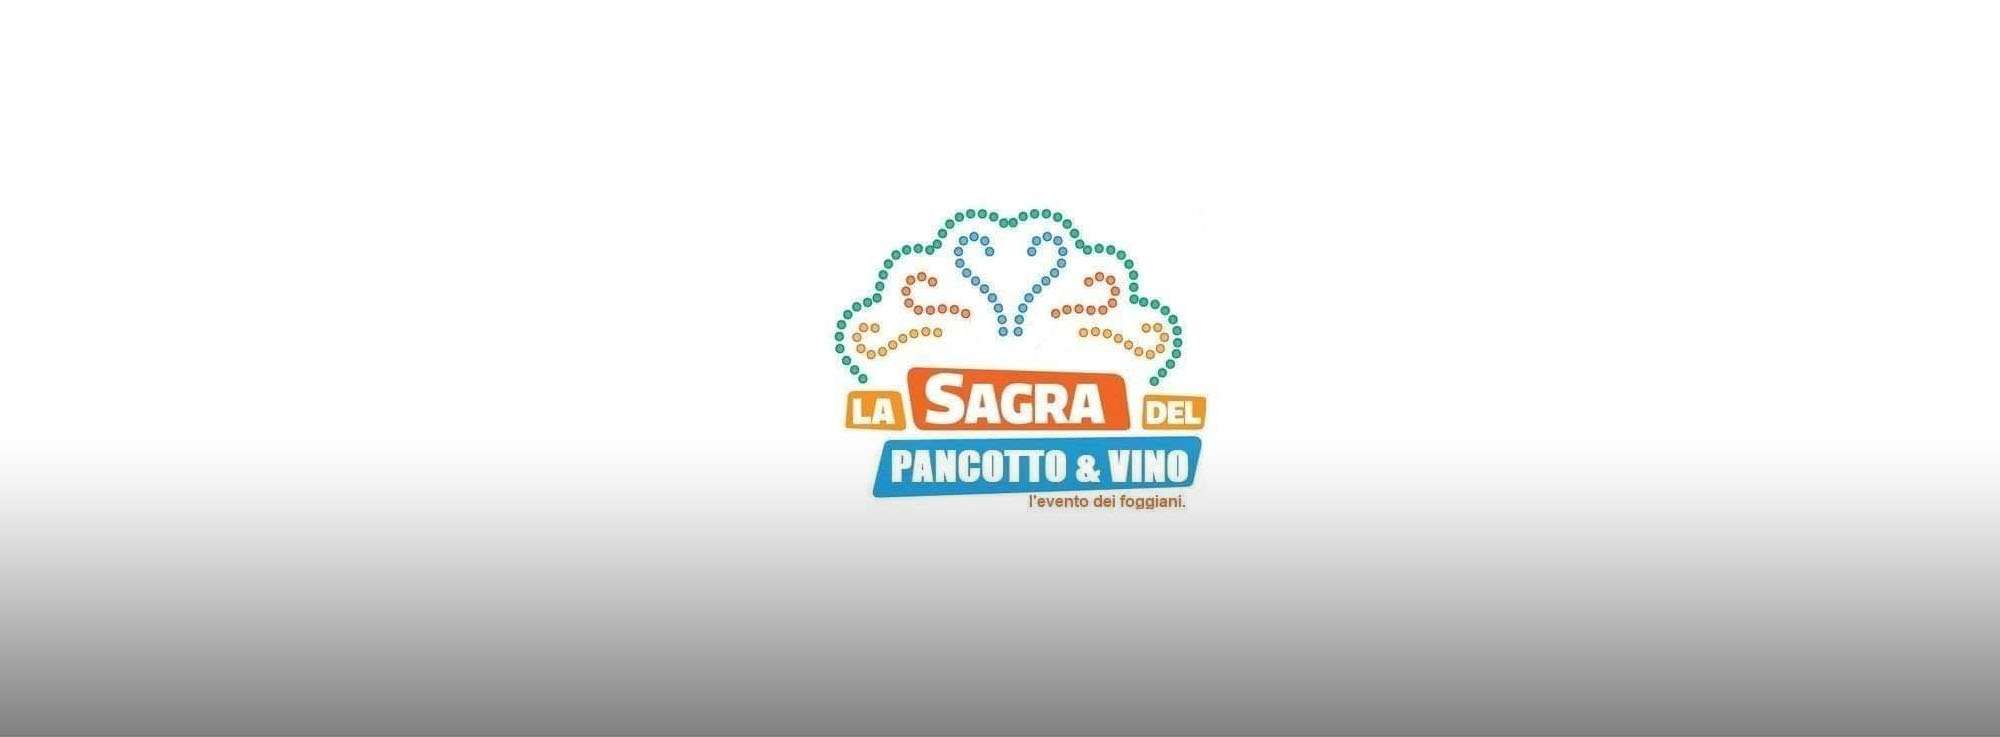 Foggia: Sagra del Pancotto & Vino #CcchiuFort